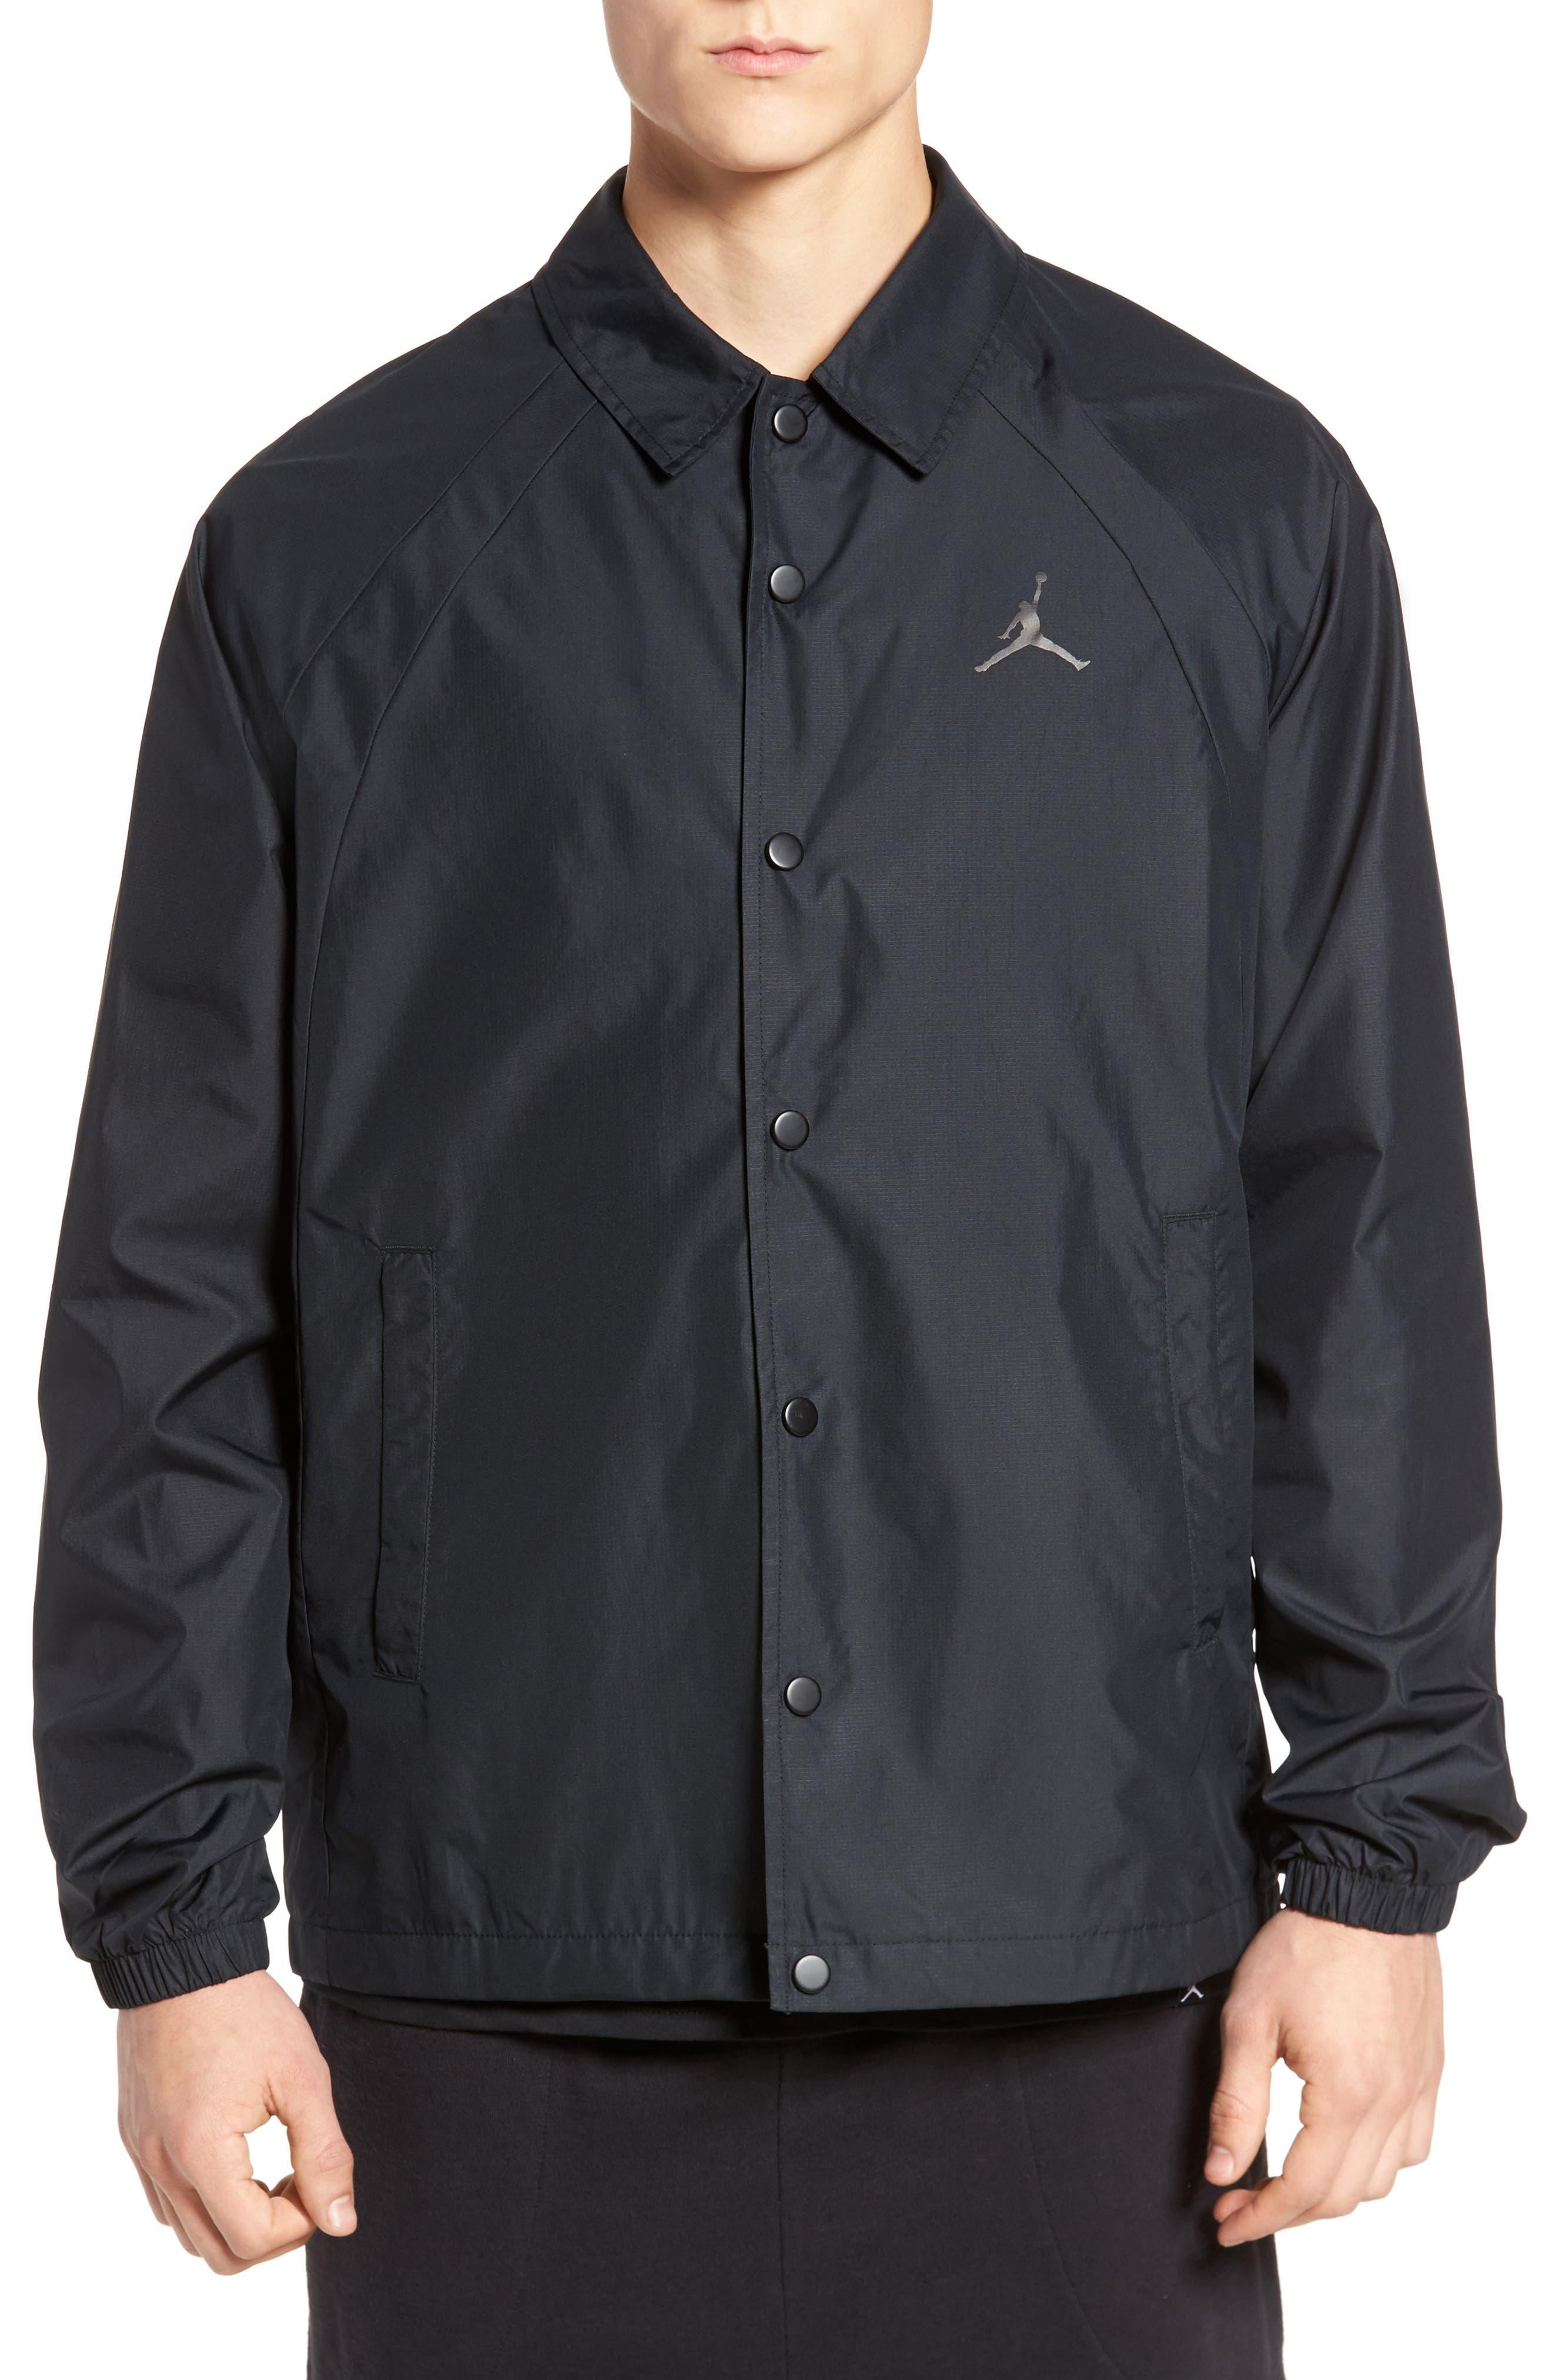 Main Image - Nike Wings Coach's Jacket